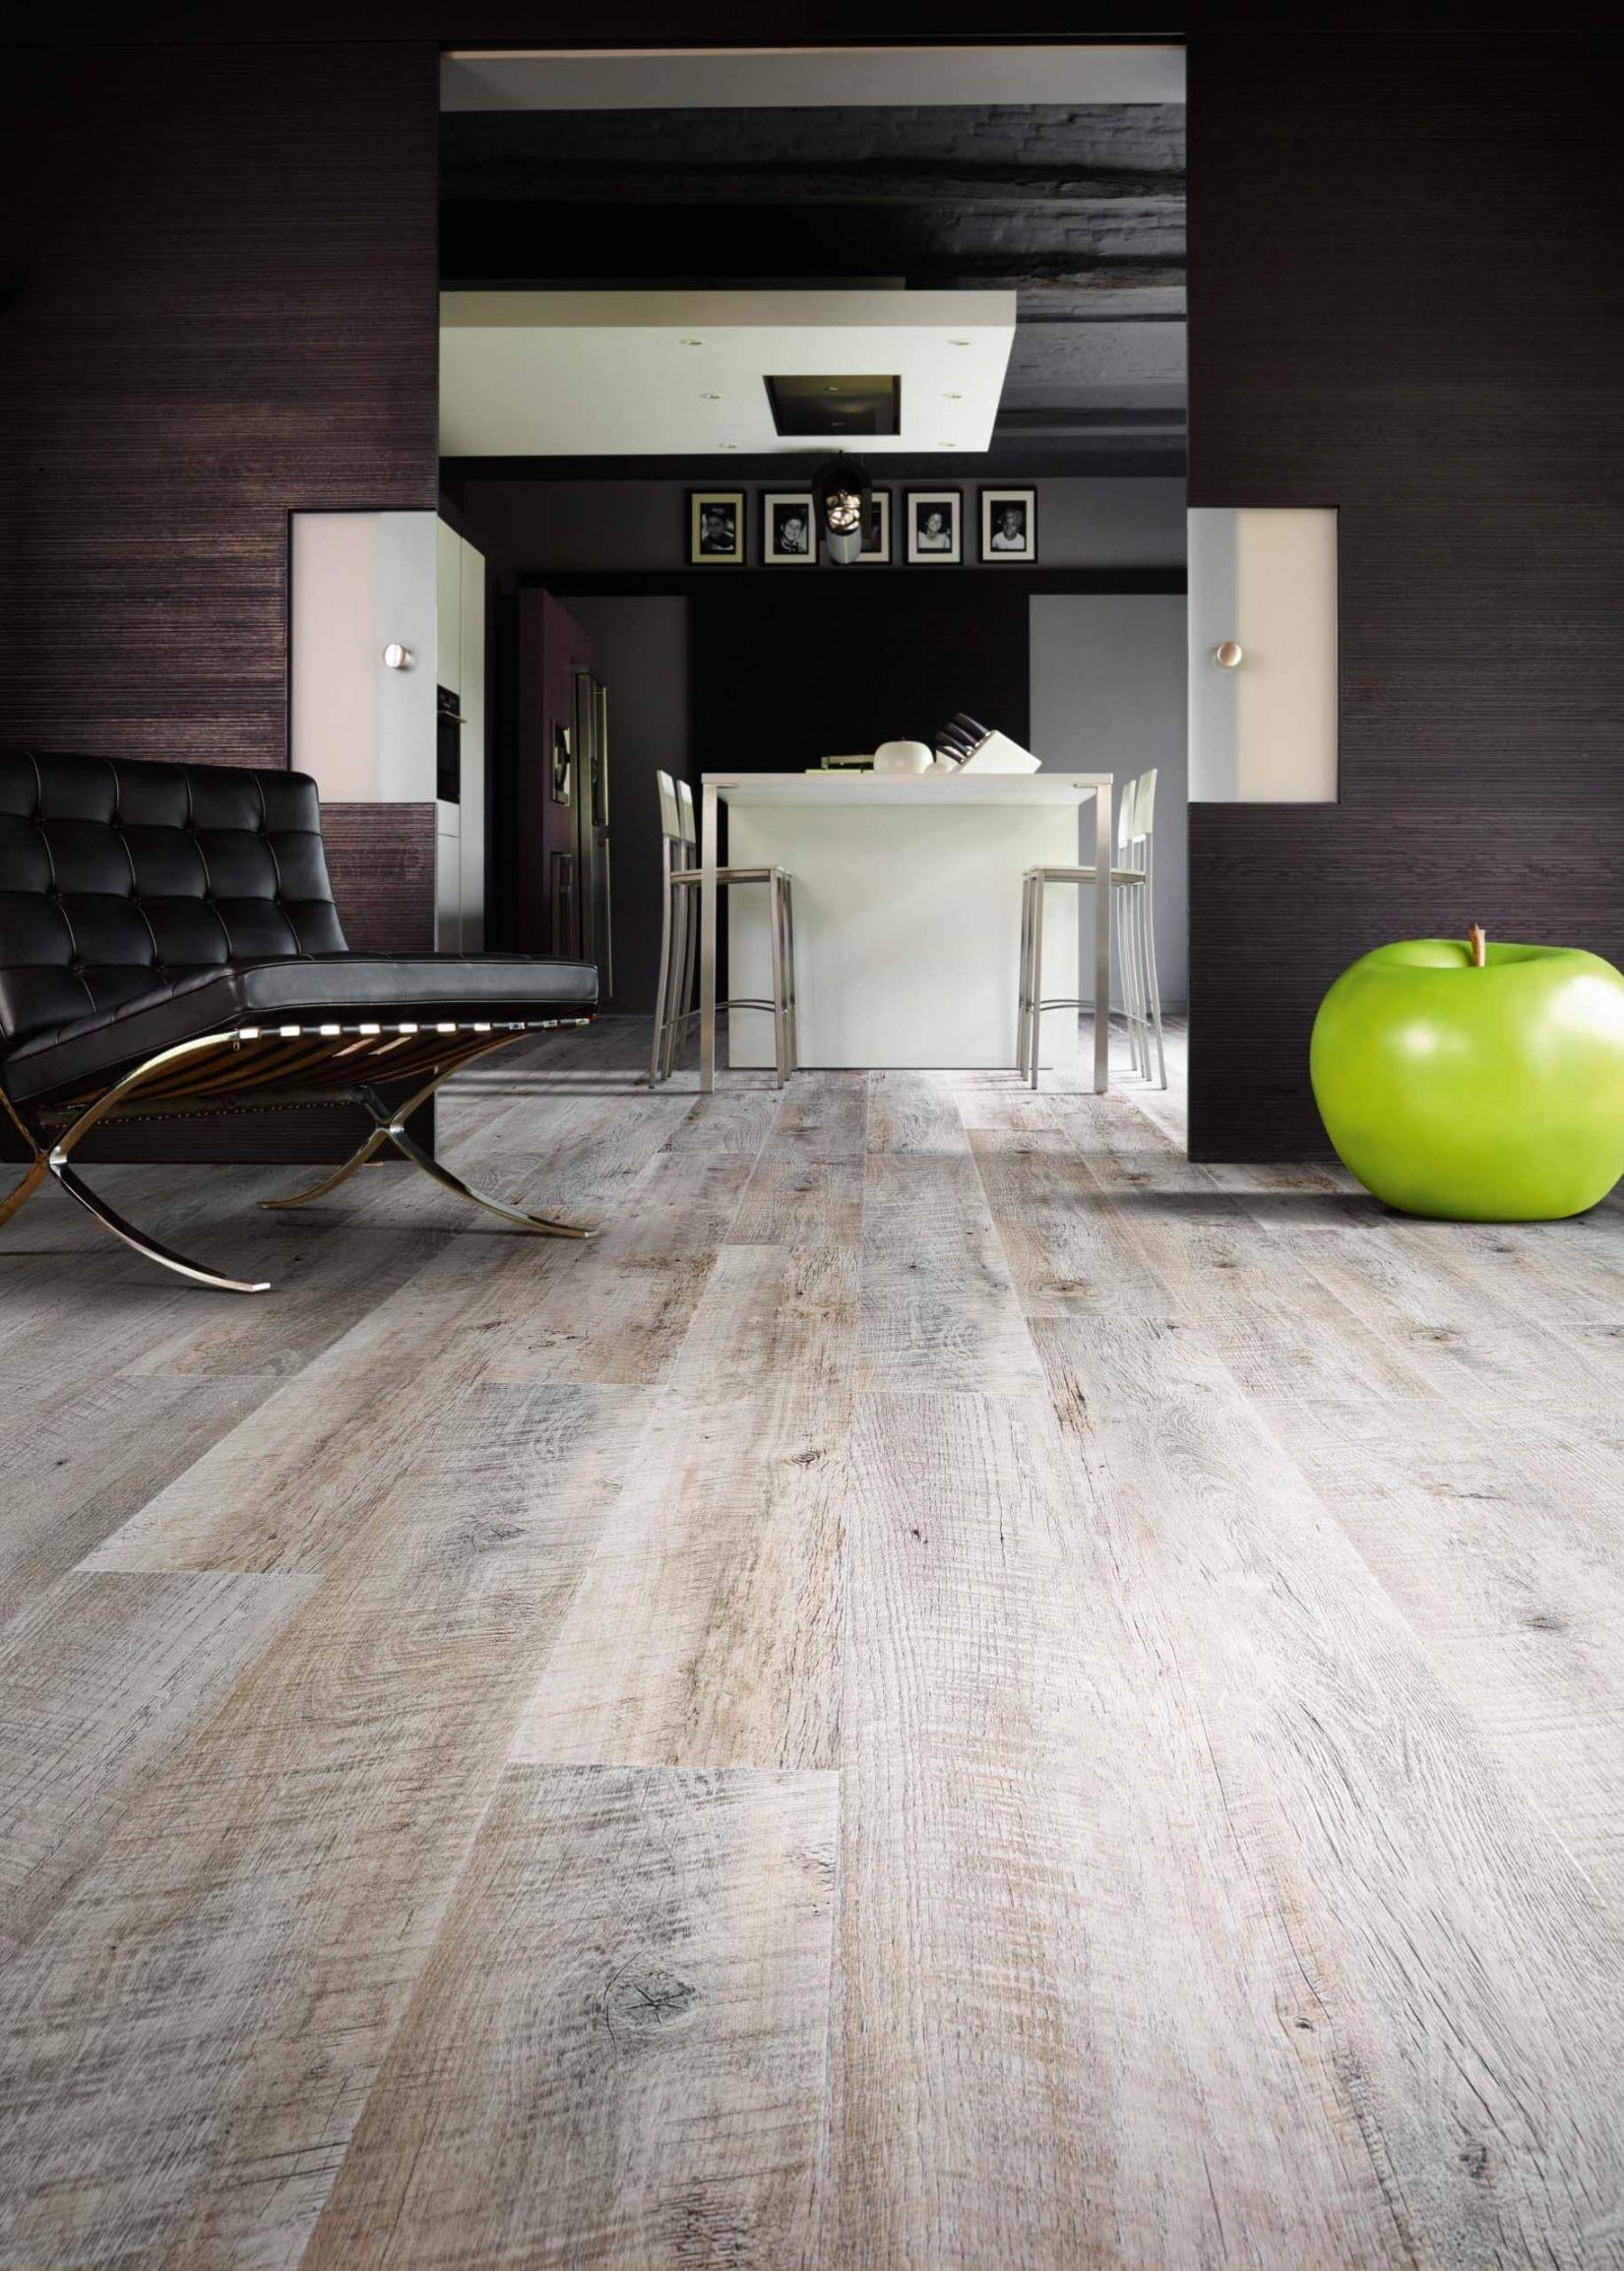 60 Vinyl Flooring Ideas Inspiration Enjoy Your Time Flooring Vinyl Flooring Kitchen Luxury Vinyl Tile Flooring